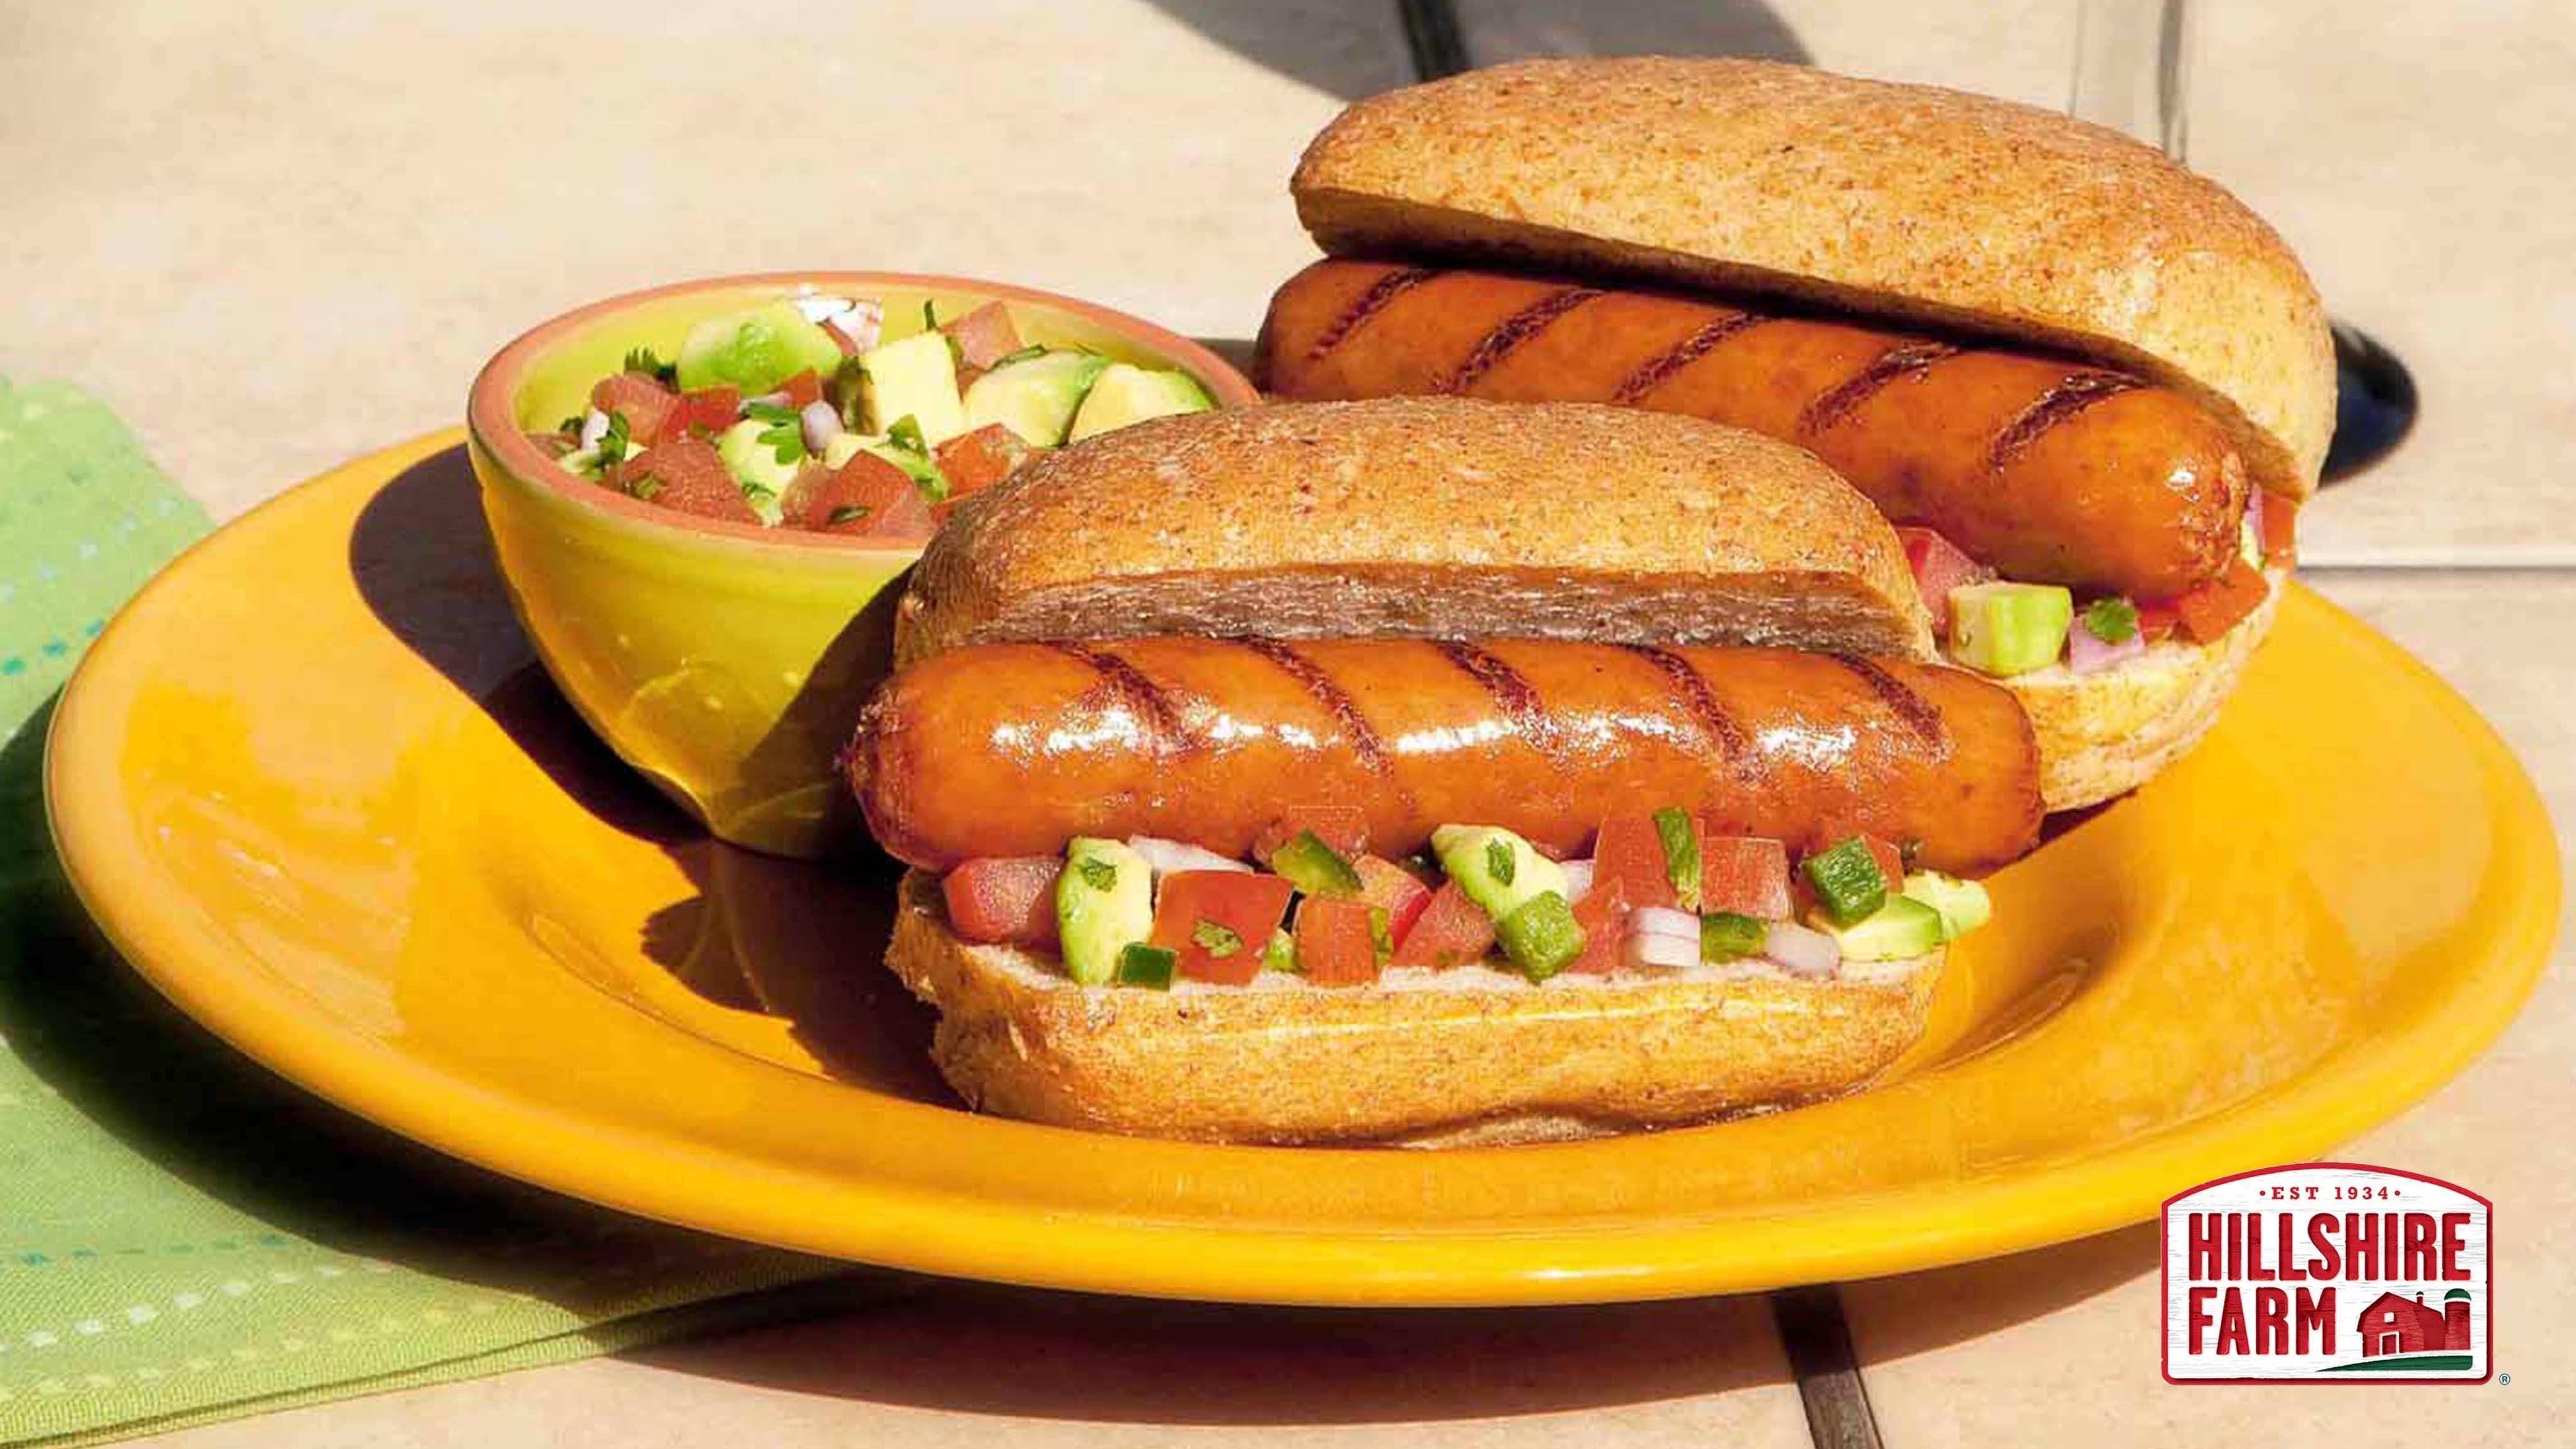 Image for Recipe Cheddarwurst Smoked Sausage Topped with Fresh Avocado Salsa